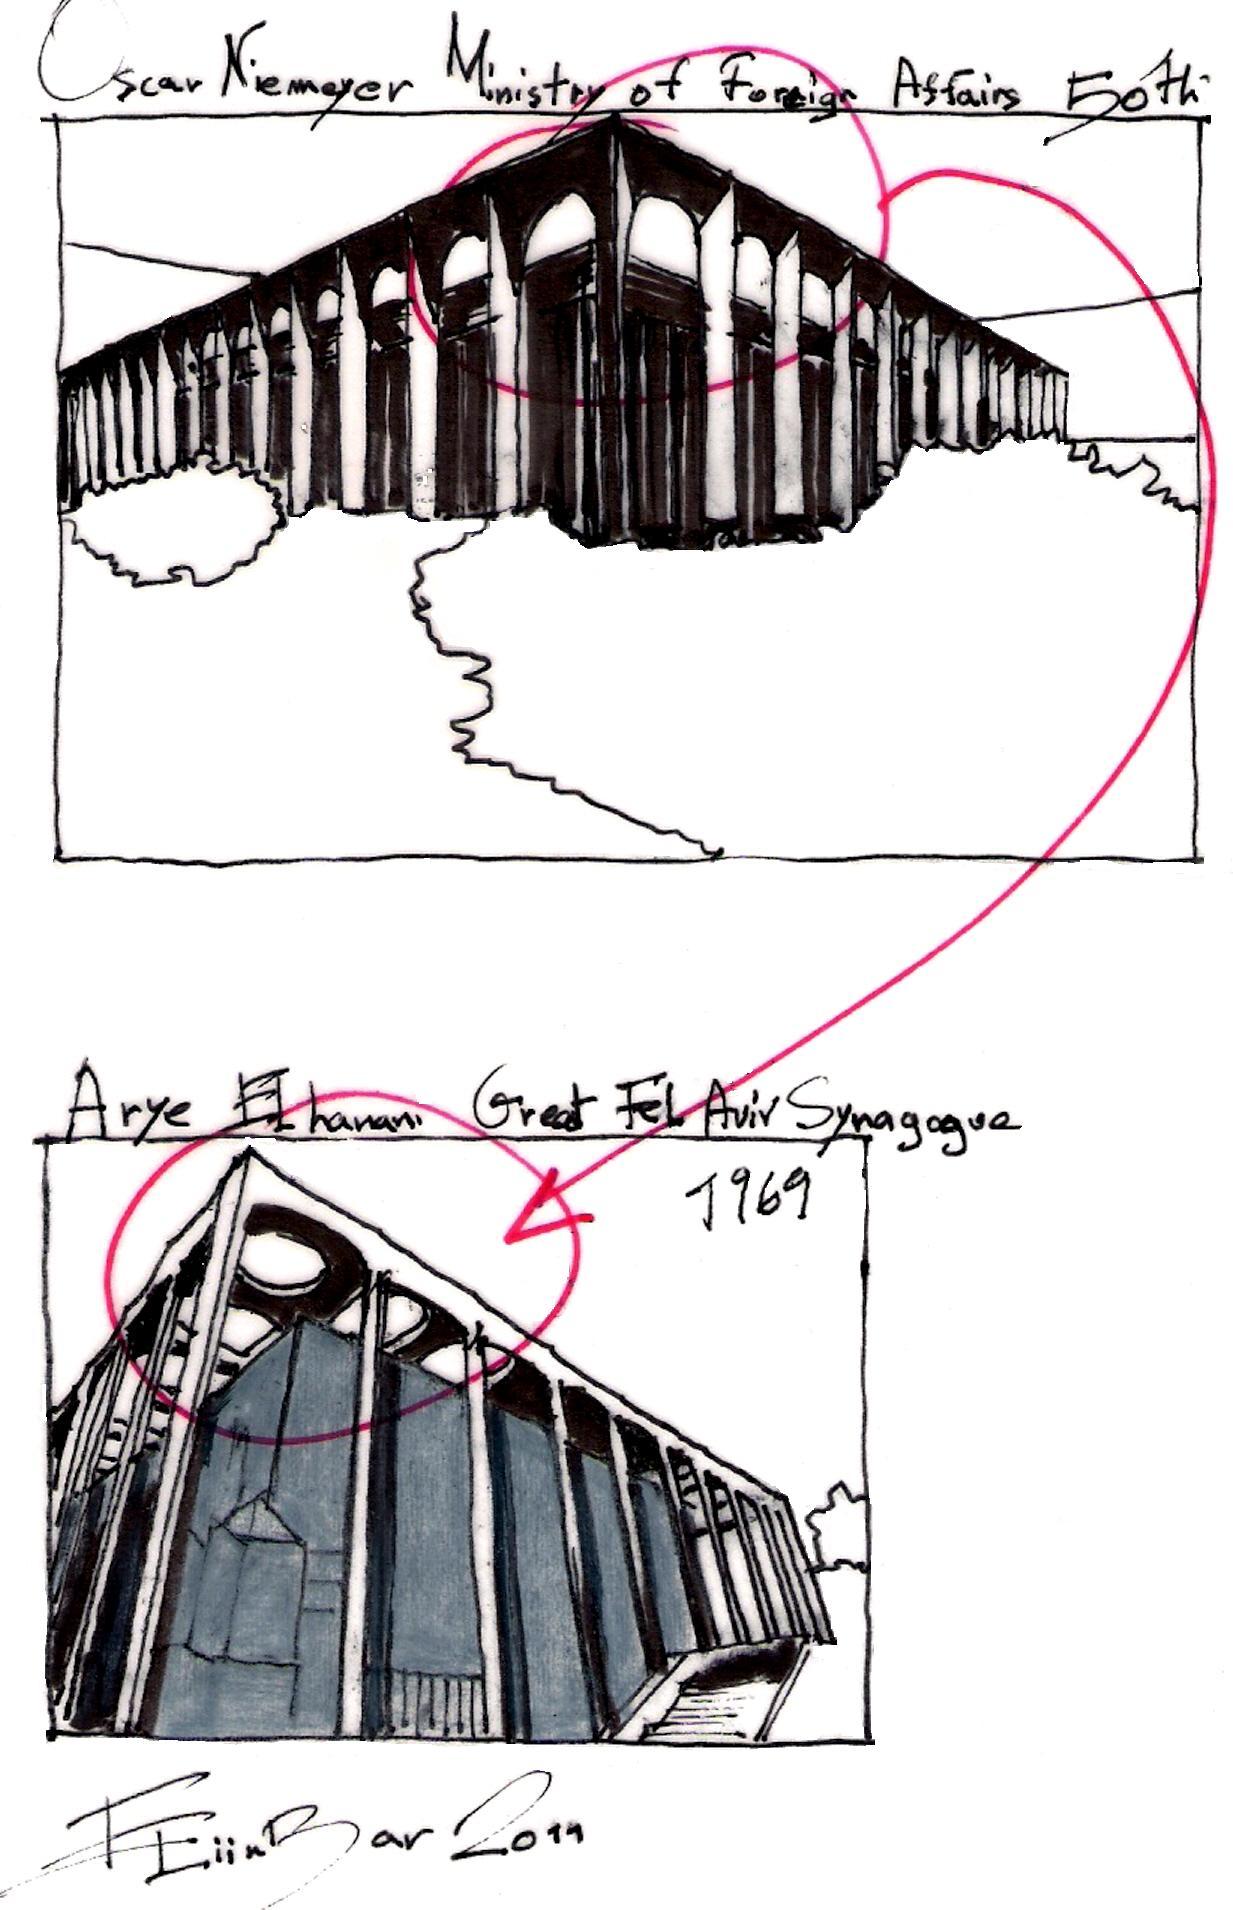 Oscar Niemeyer Eliinbar Sketches 201100011 Someone Has